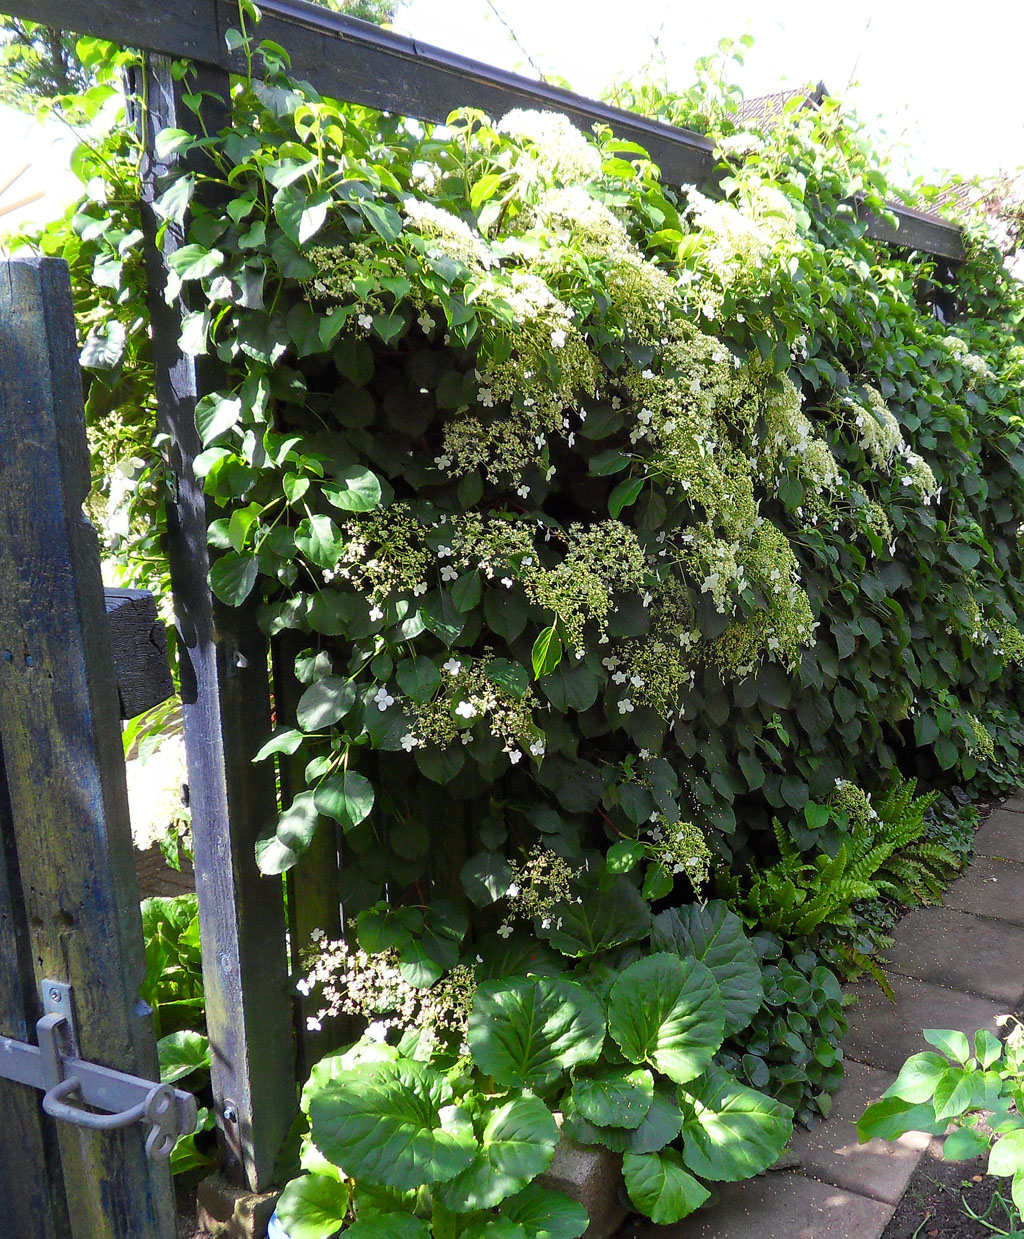 Trädgård plank trädgård : Cornelias & Hans trädgÃ¥rd | i TRÄDGÅRDEN